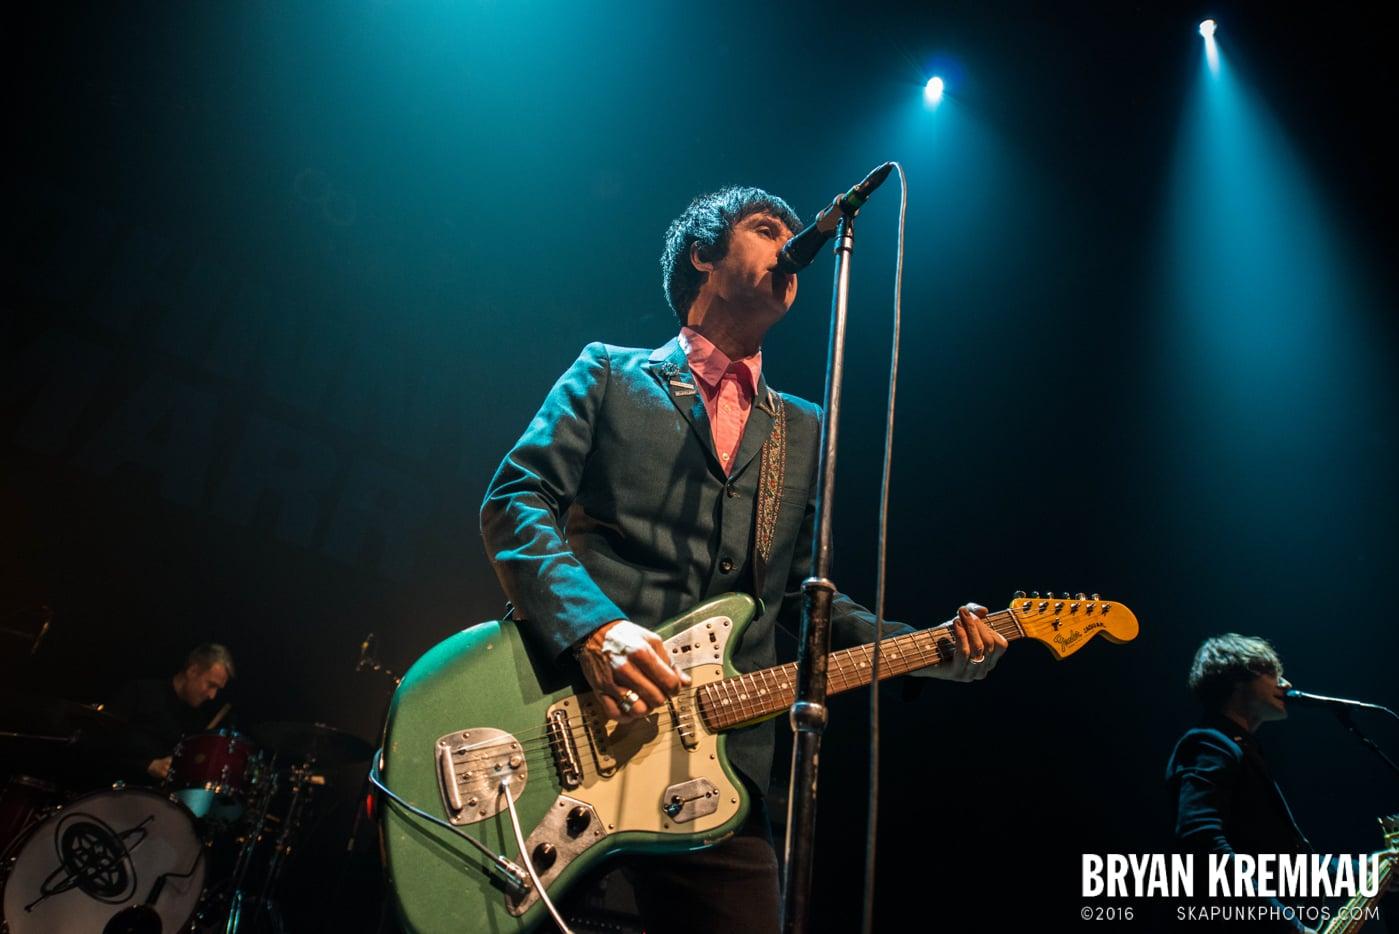 Johnny Marr @ Gramercy Theatre, NYC - 11.12.14 (17)